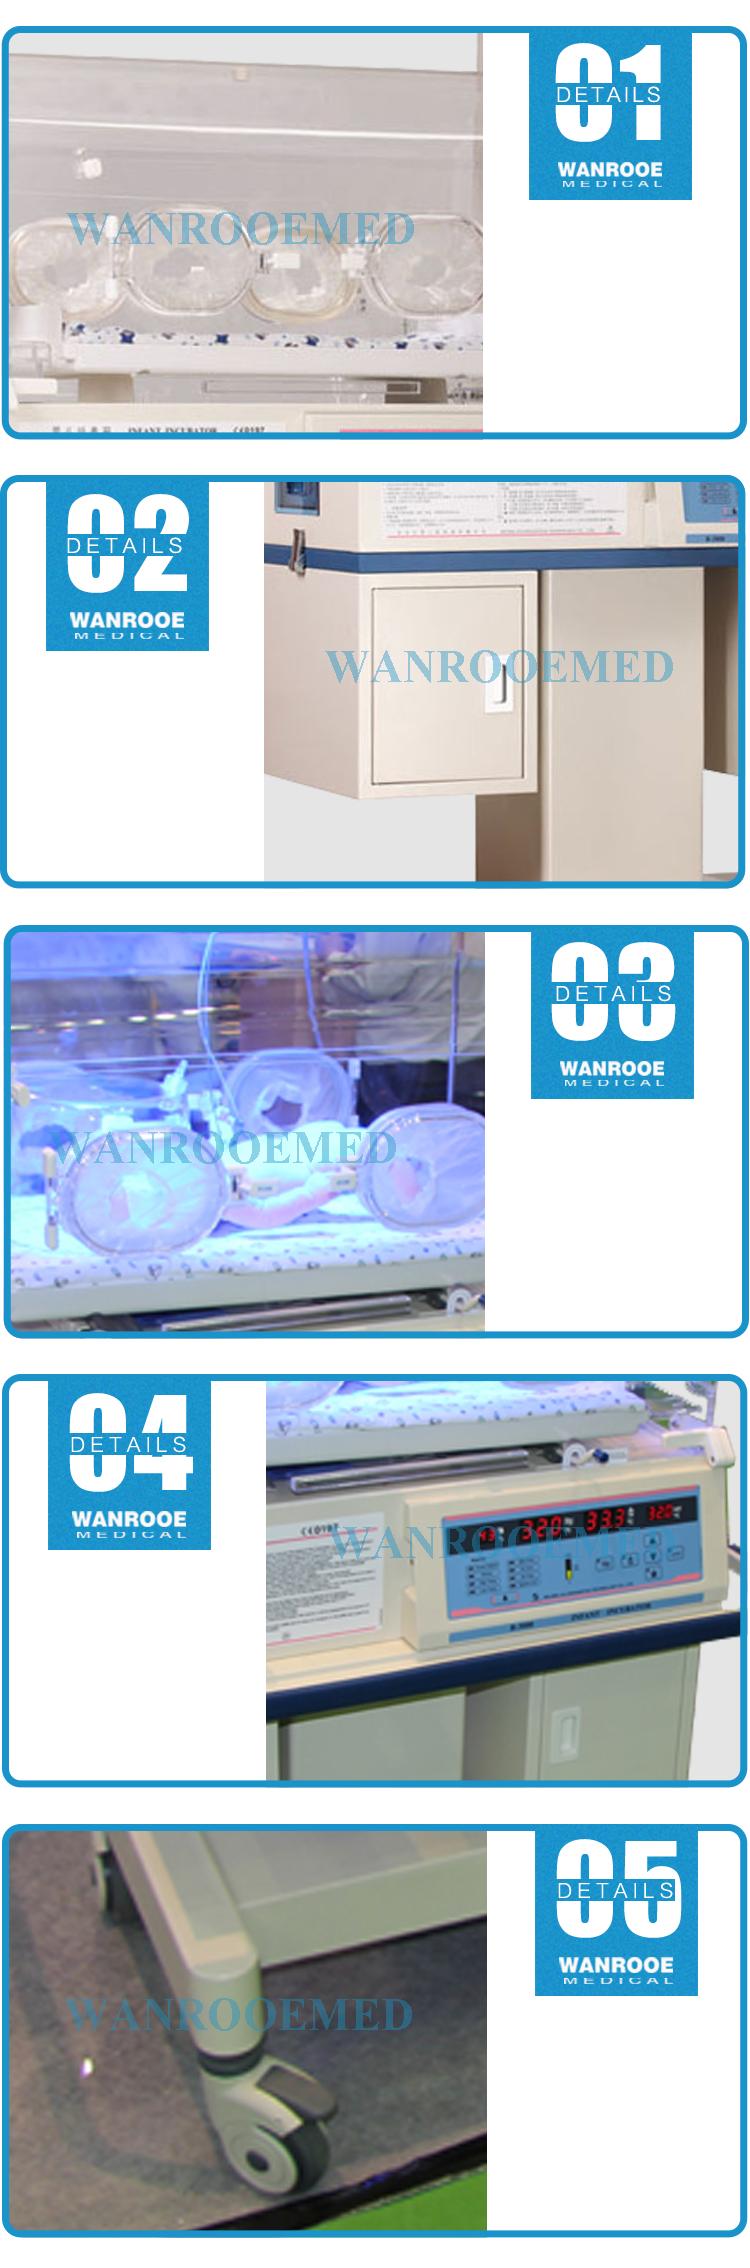 Neonatal Baby Warmer, Hospital Infant Incubator, Medical Infant Warmer, Baby Transport Incubator